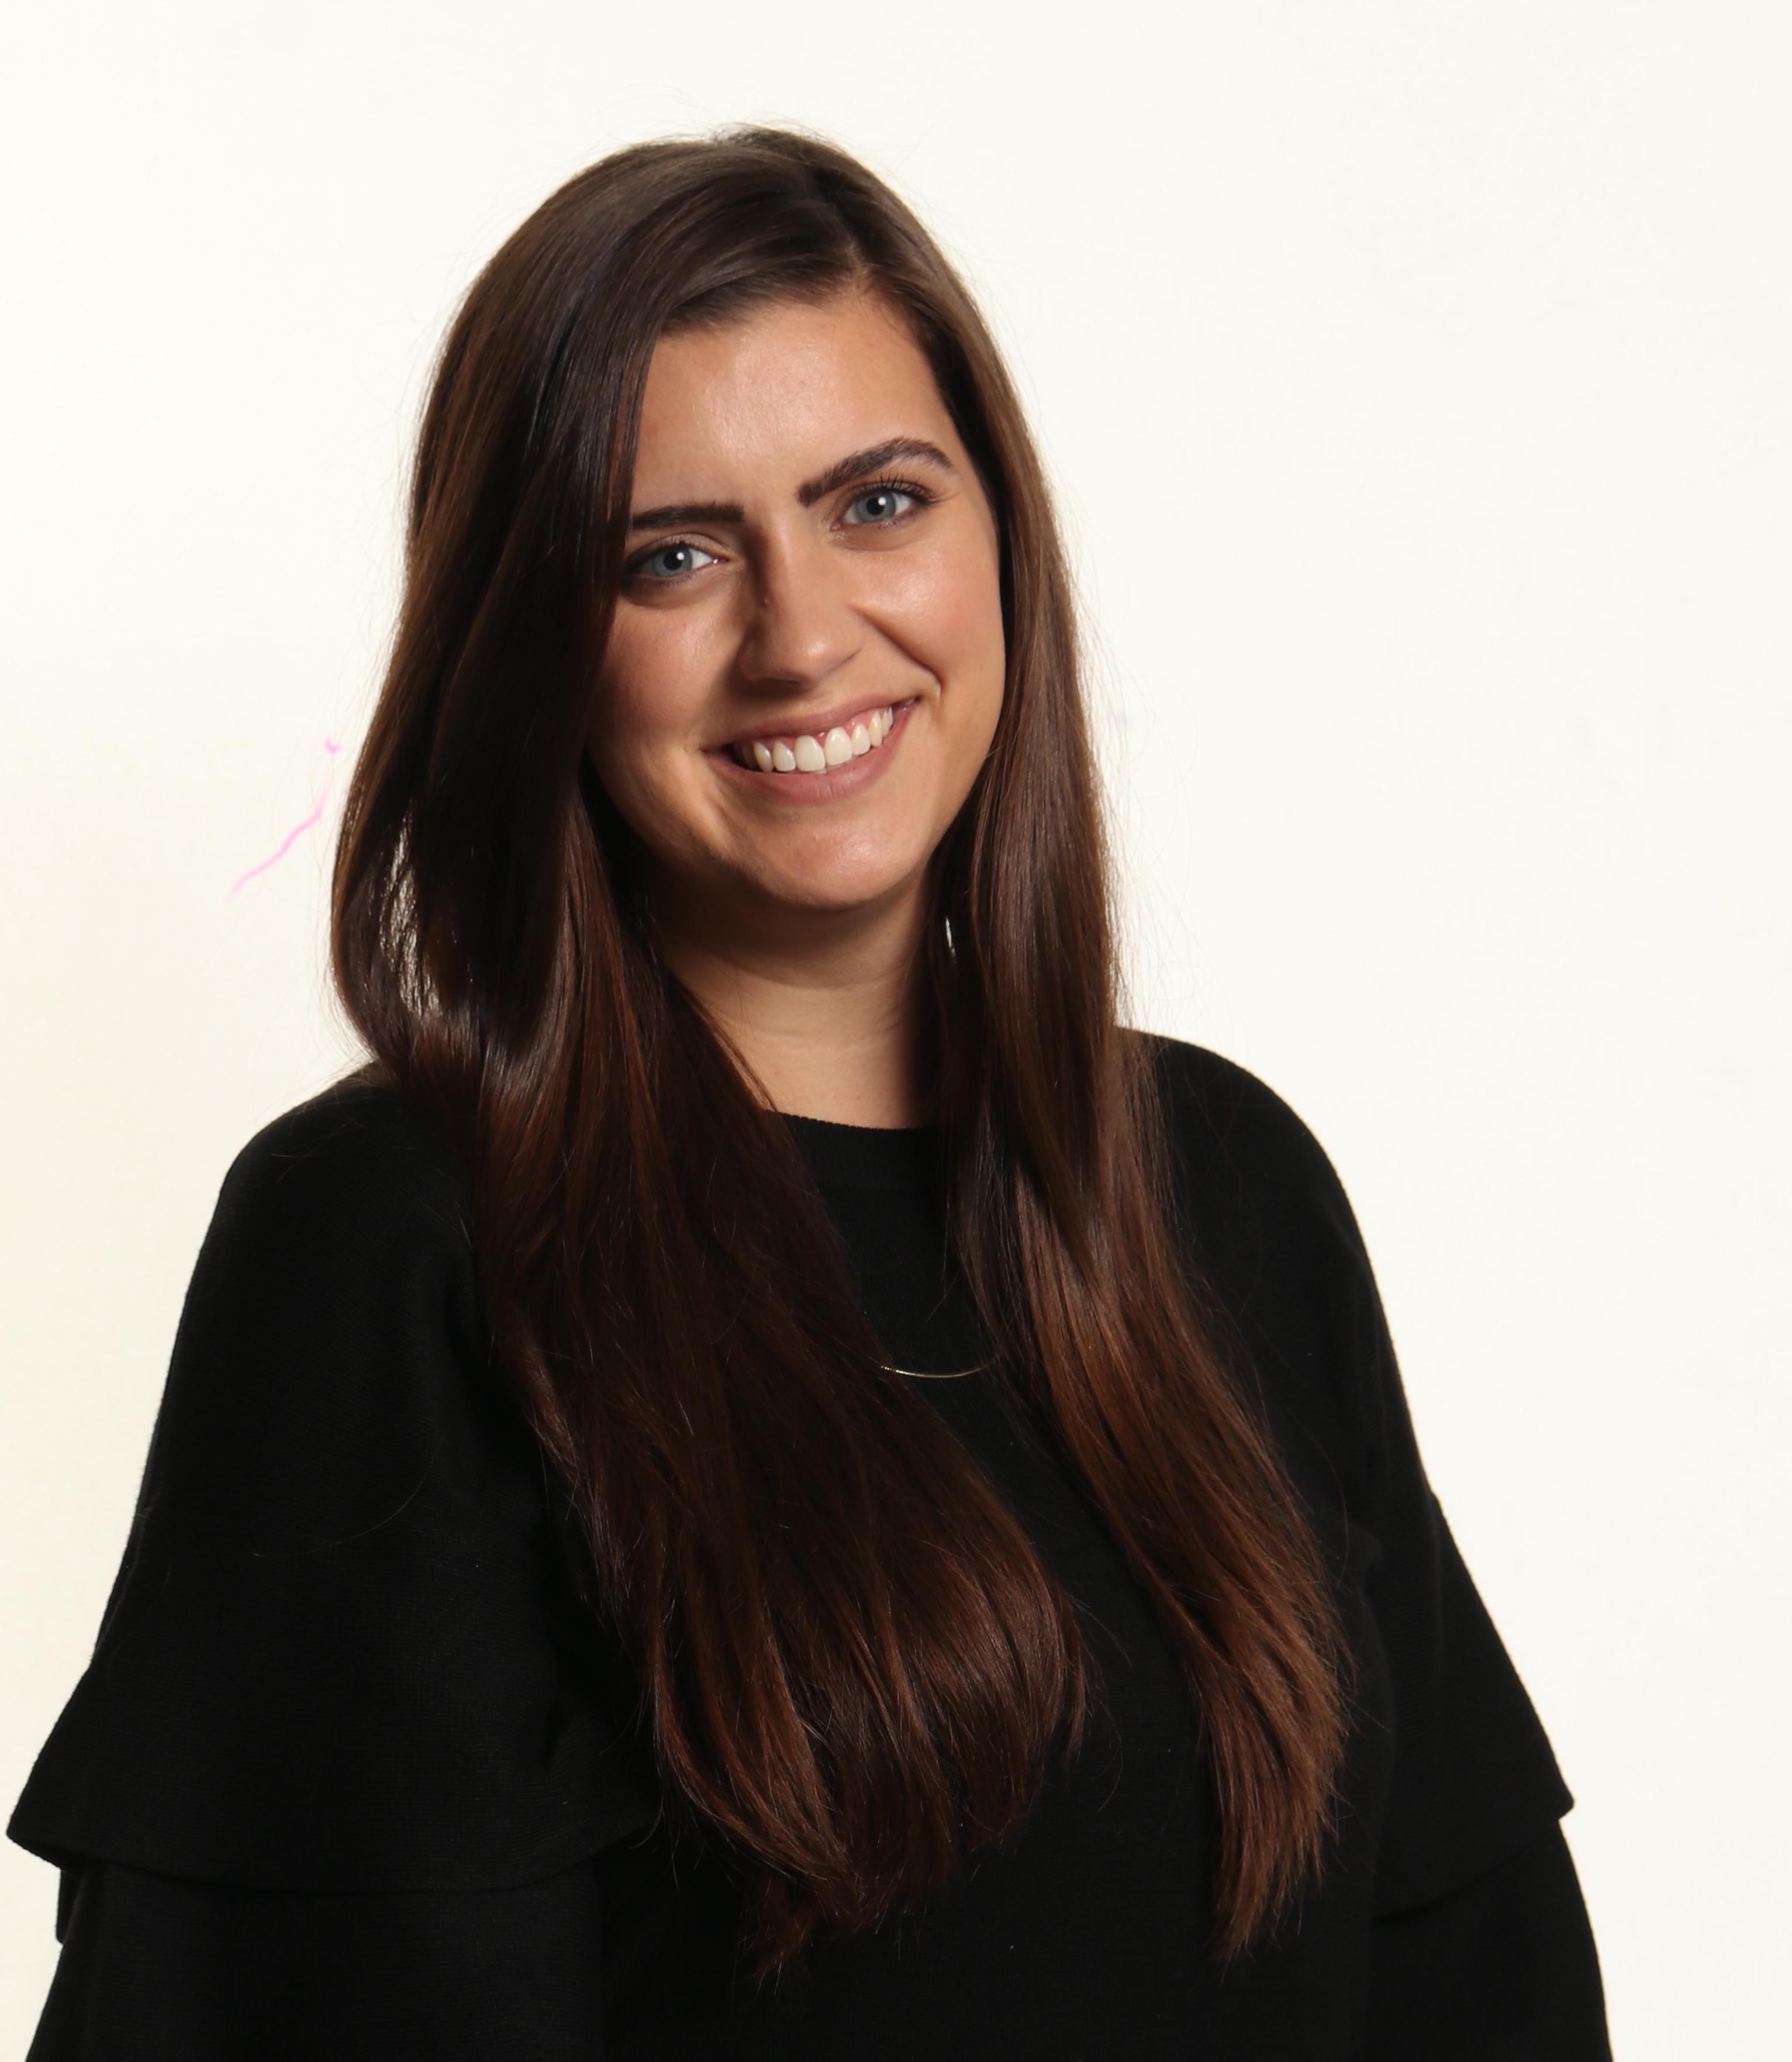 Priscilla Meairs